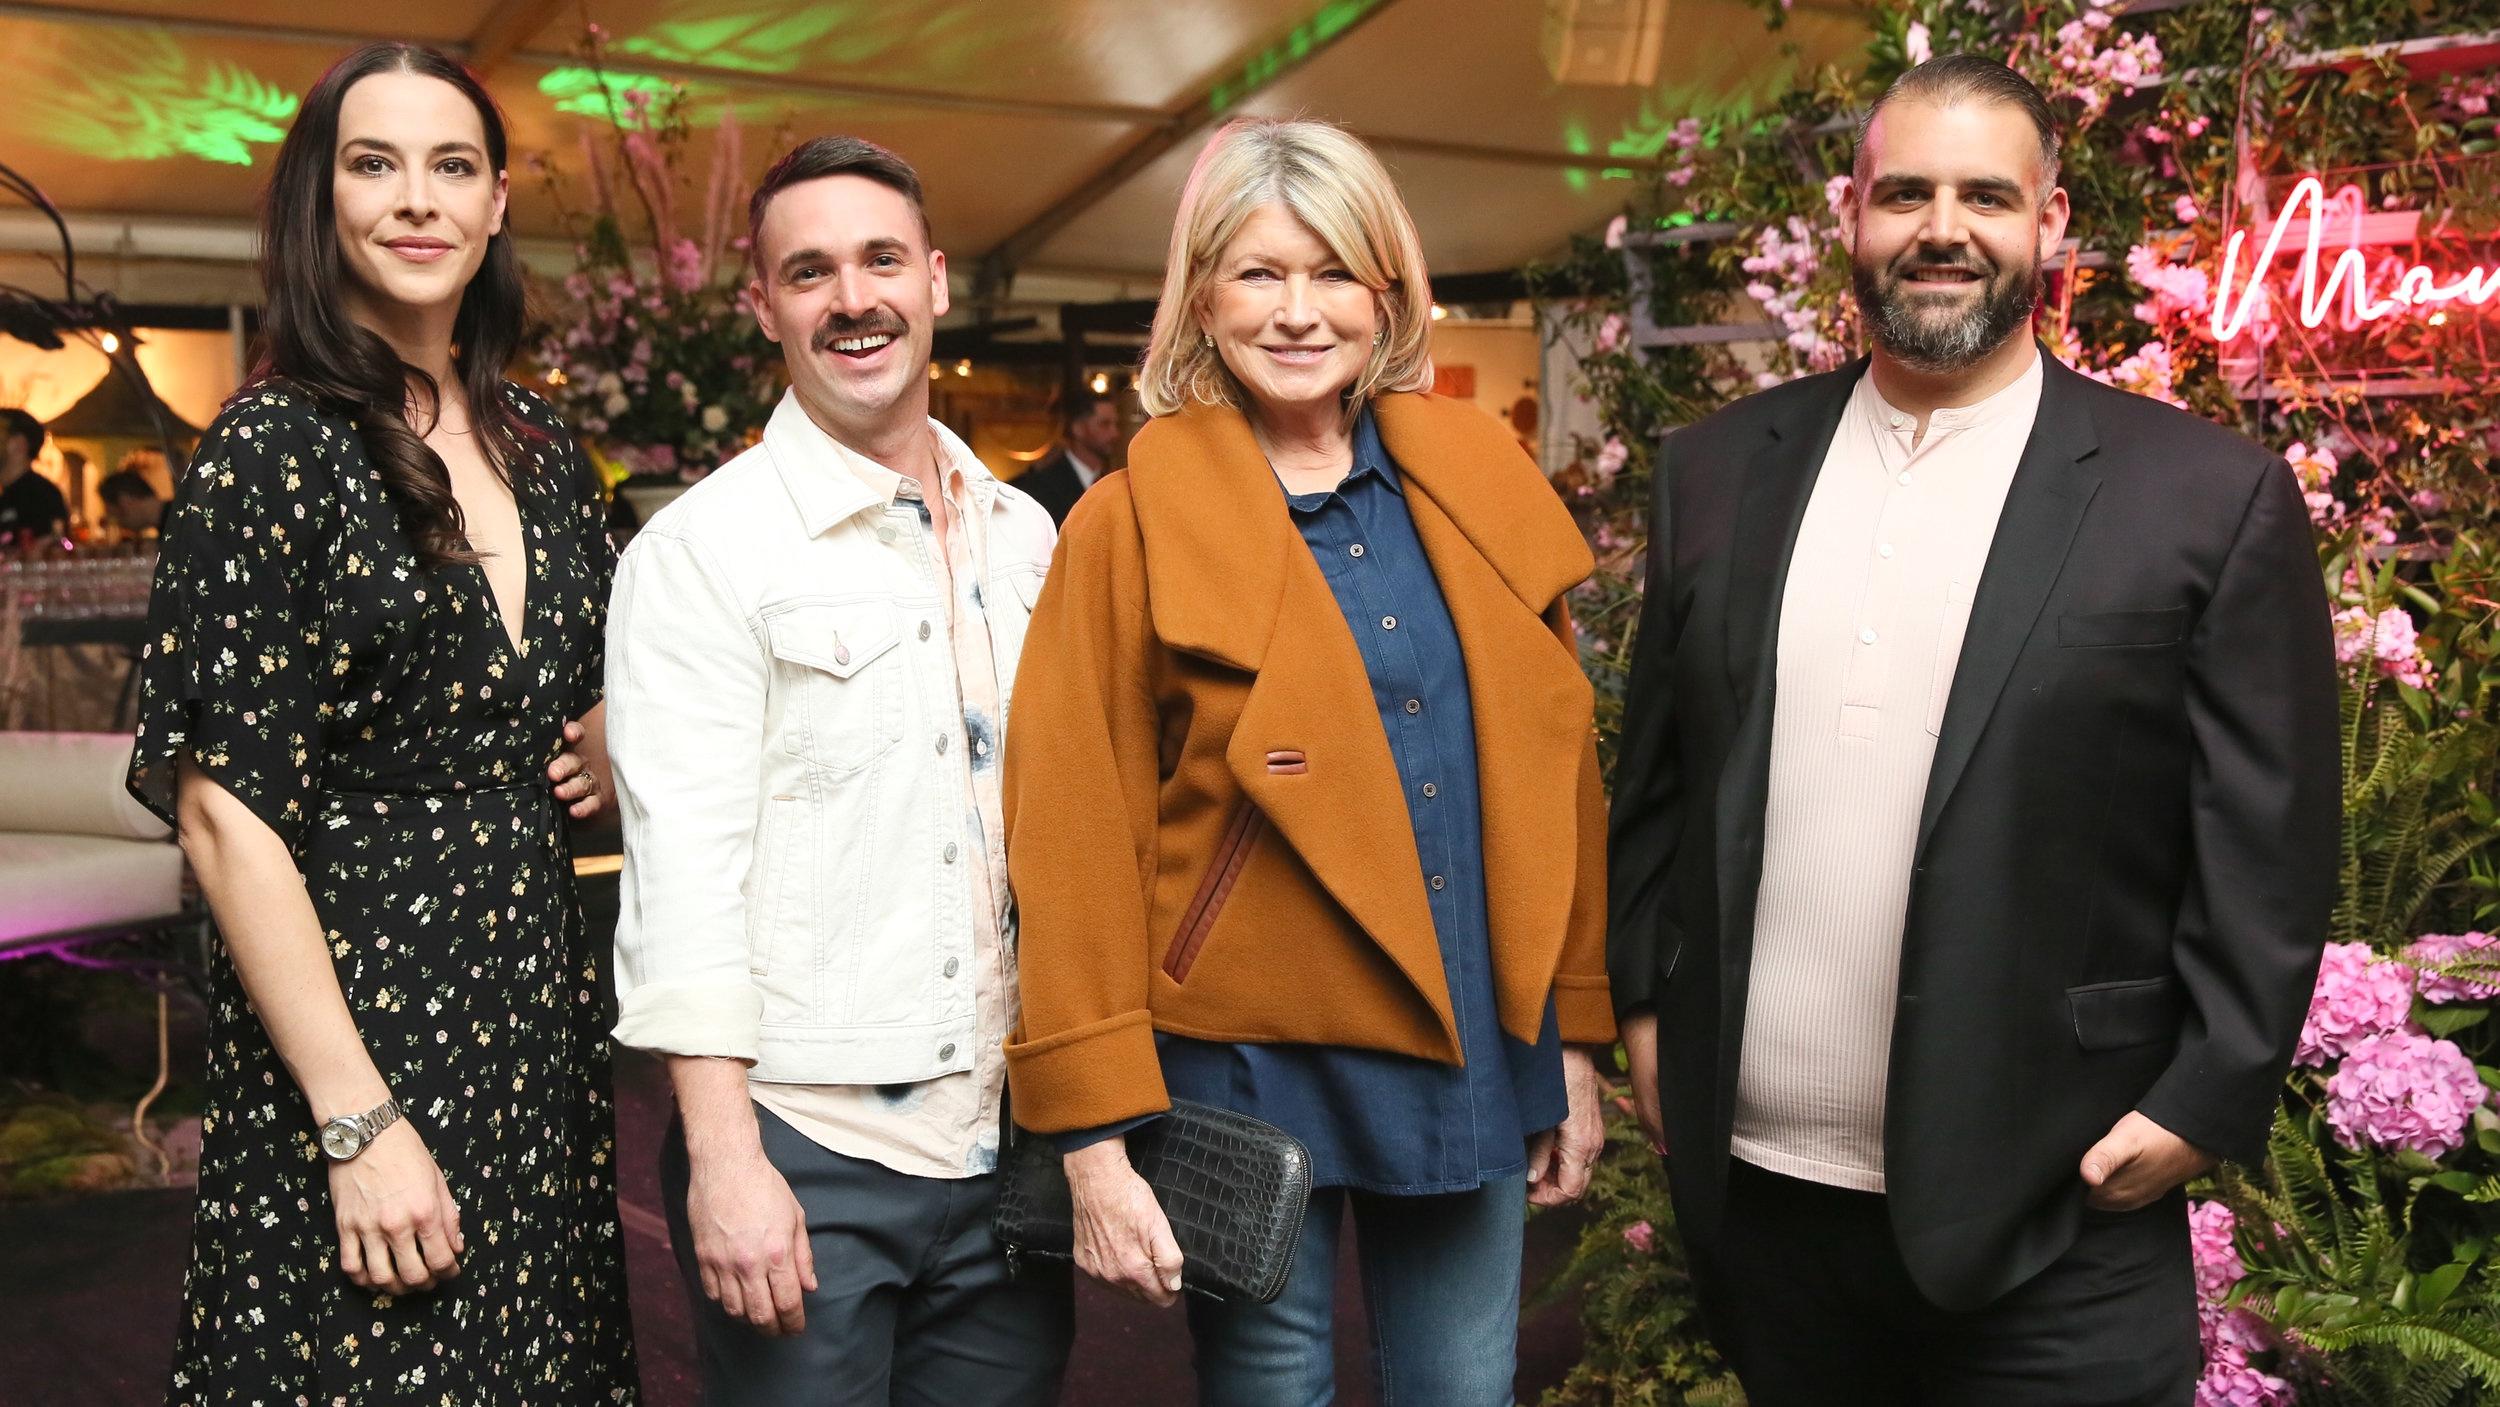 Founders Mel Brasier, Garrett Magee, Martha Stewart (Not a Manscaper) and James DeSantis